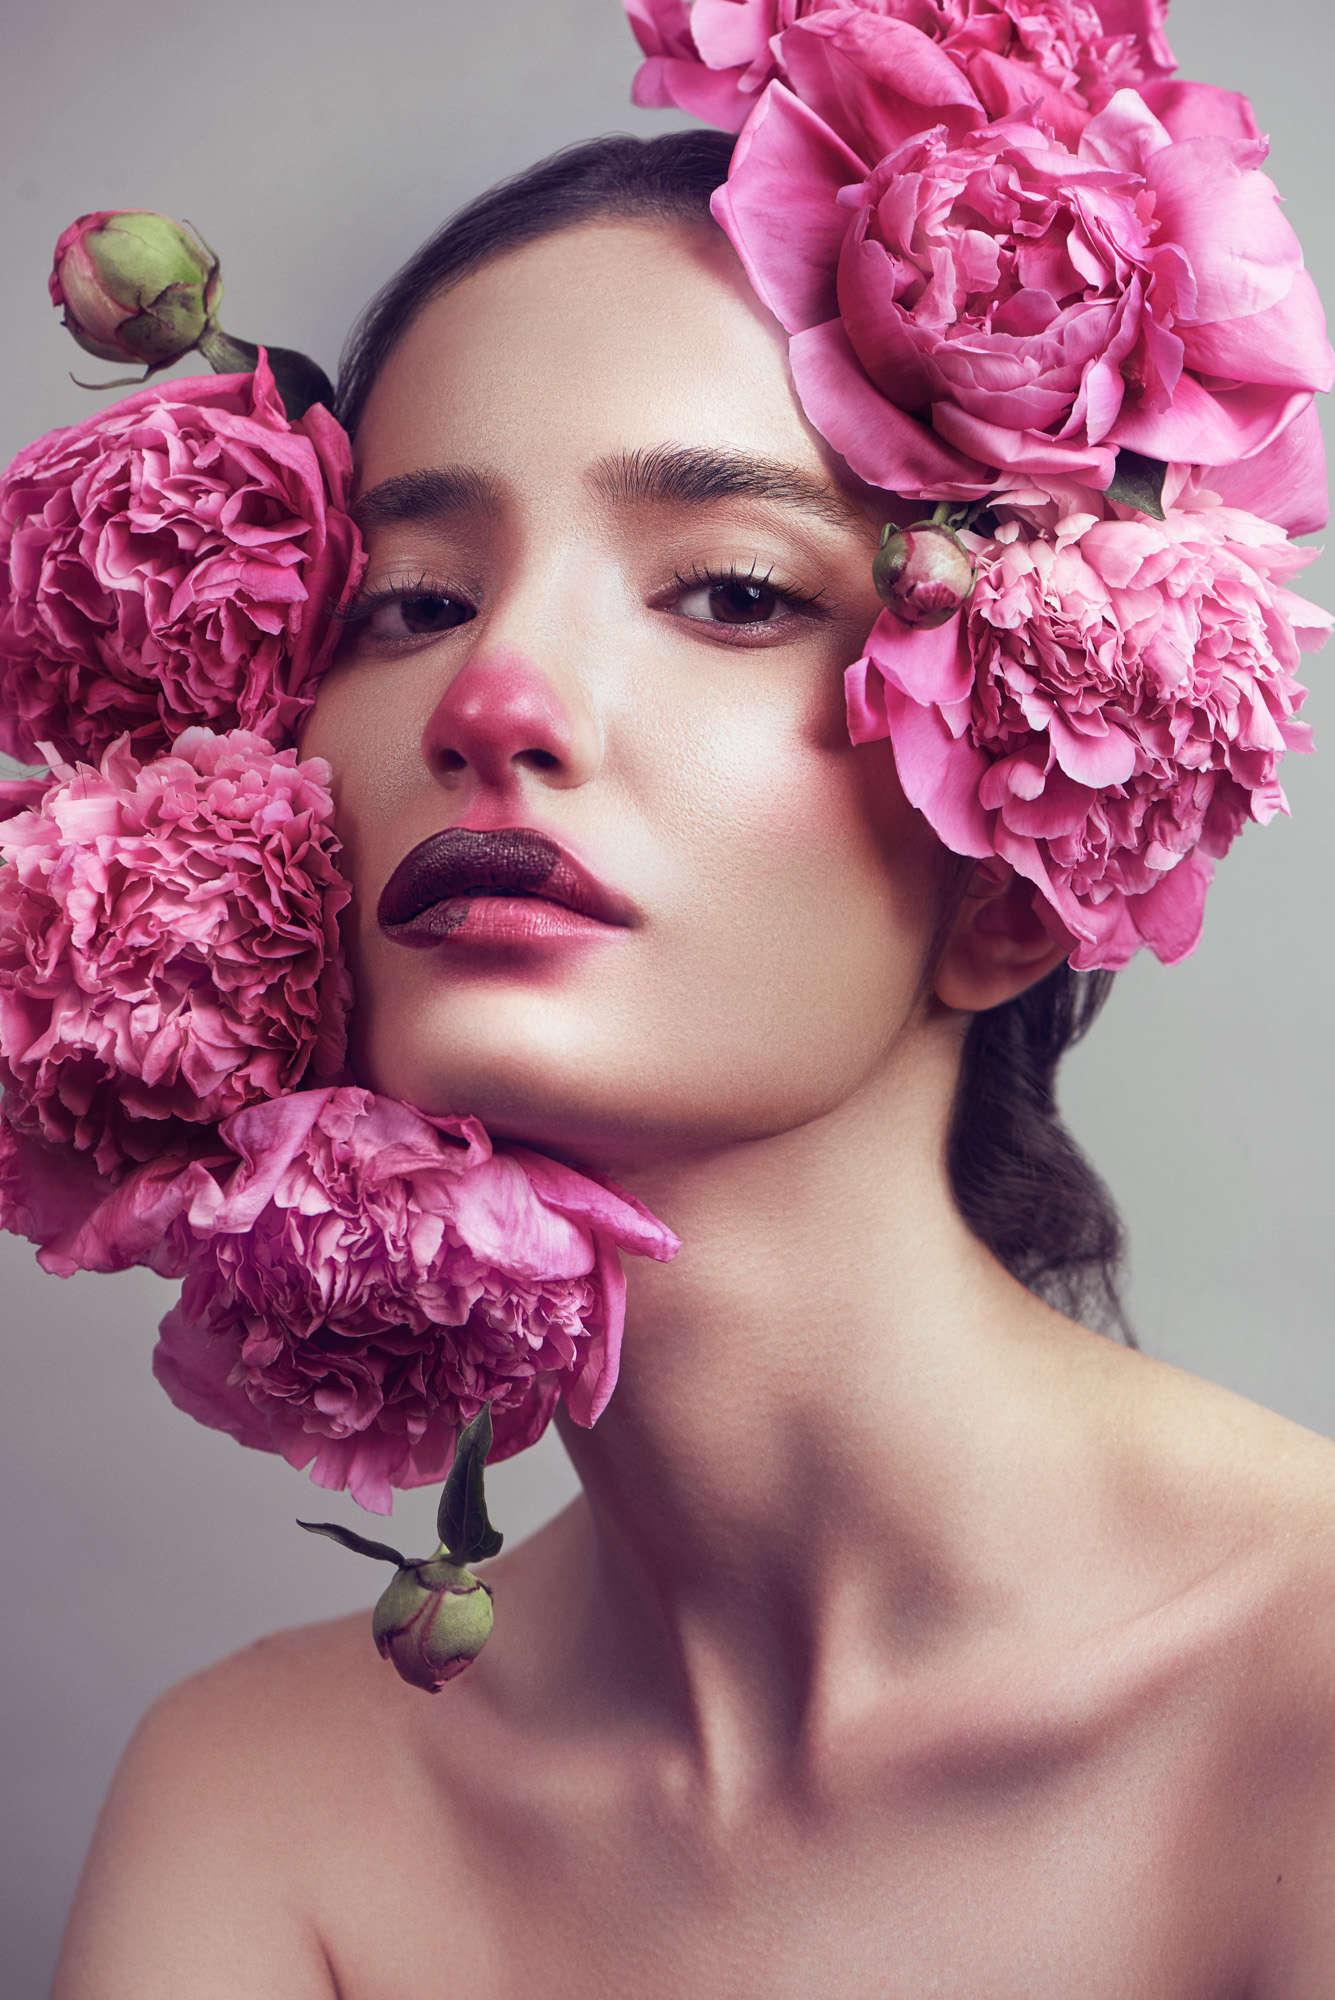 Peyman Naderi - Princesse Enfermee Dans Des Fleurs